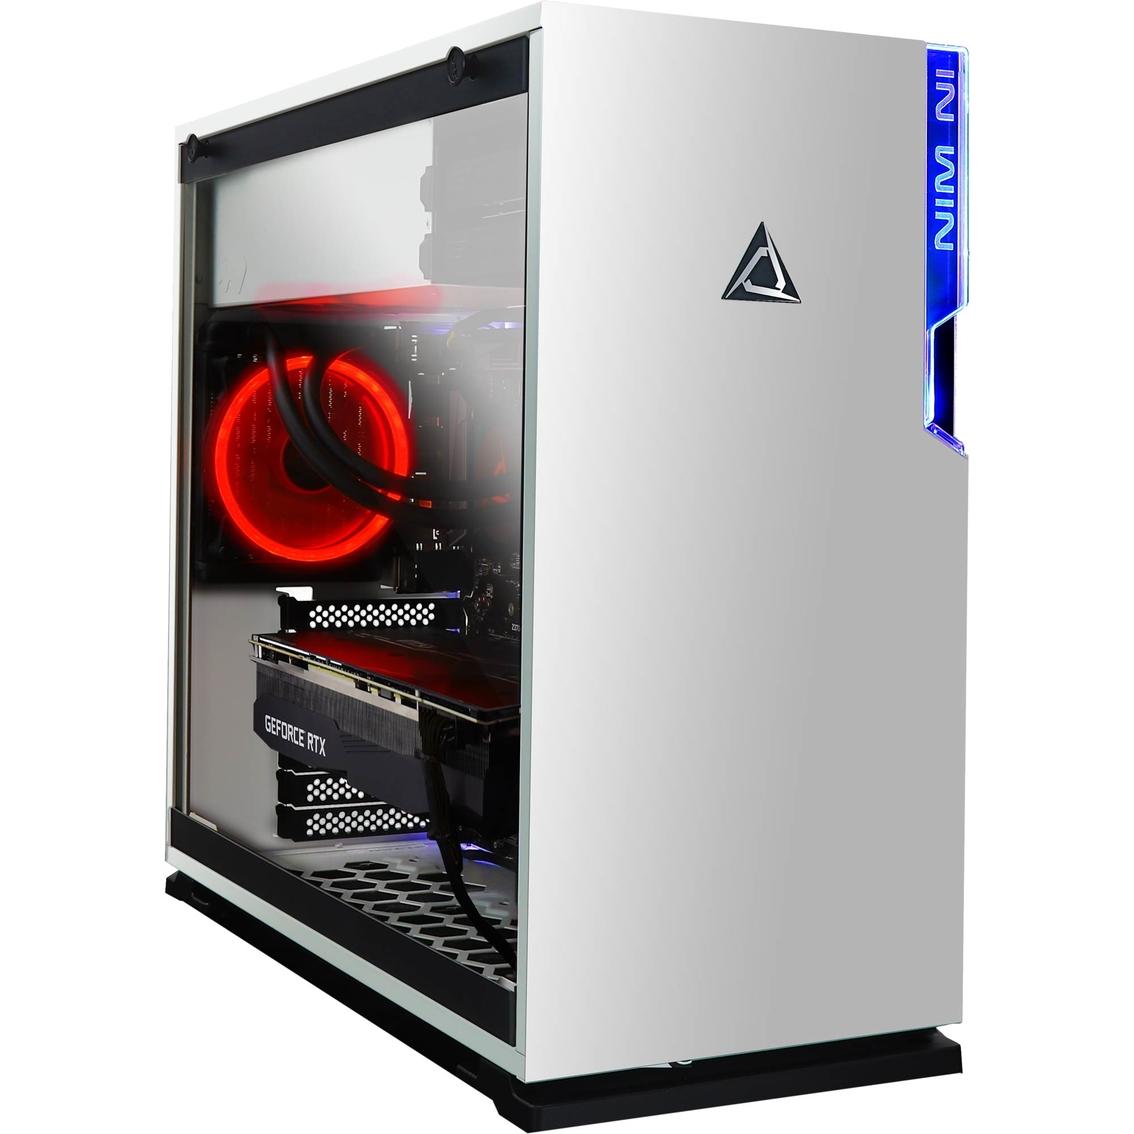 Clx Set Amd Ryzen 7 2700x 3 7ghz 8 Core 16gb Ram Rtx 2060 6gb Gaming